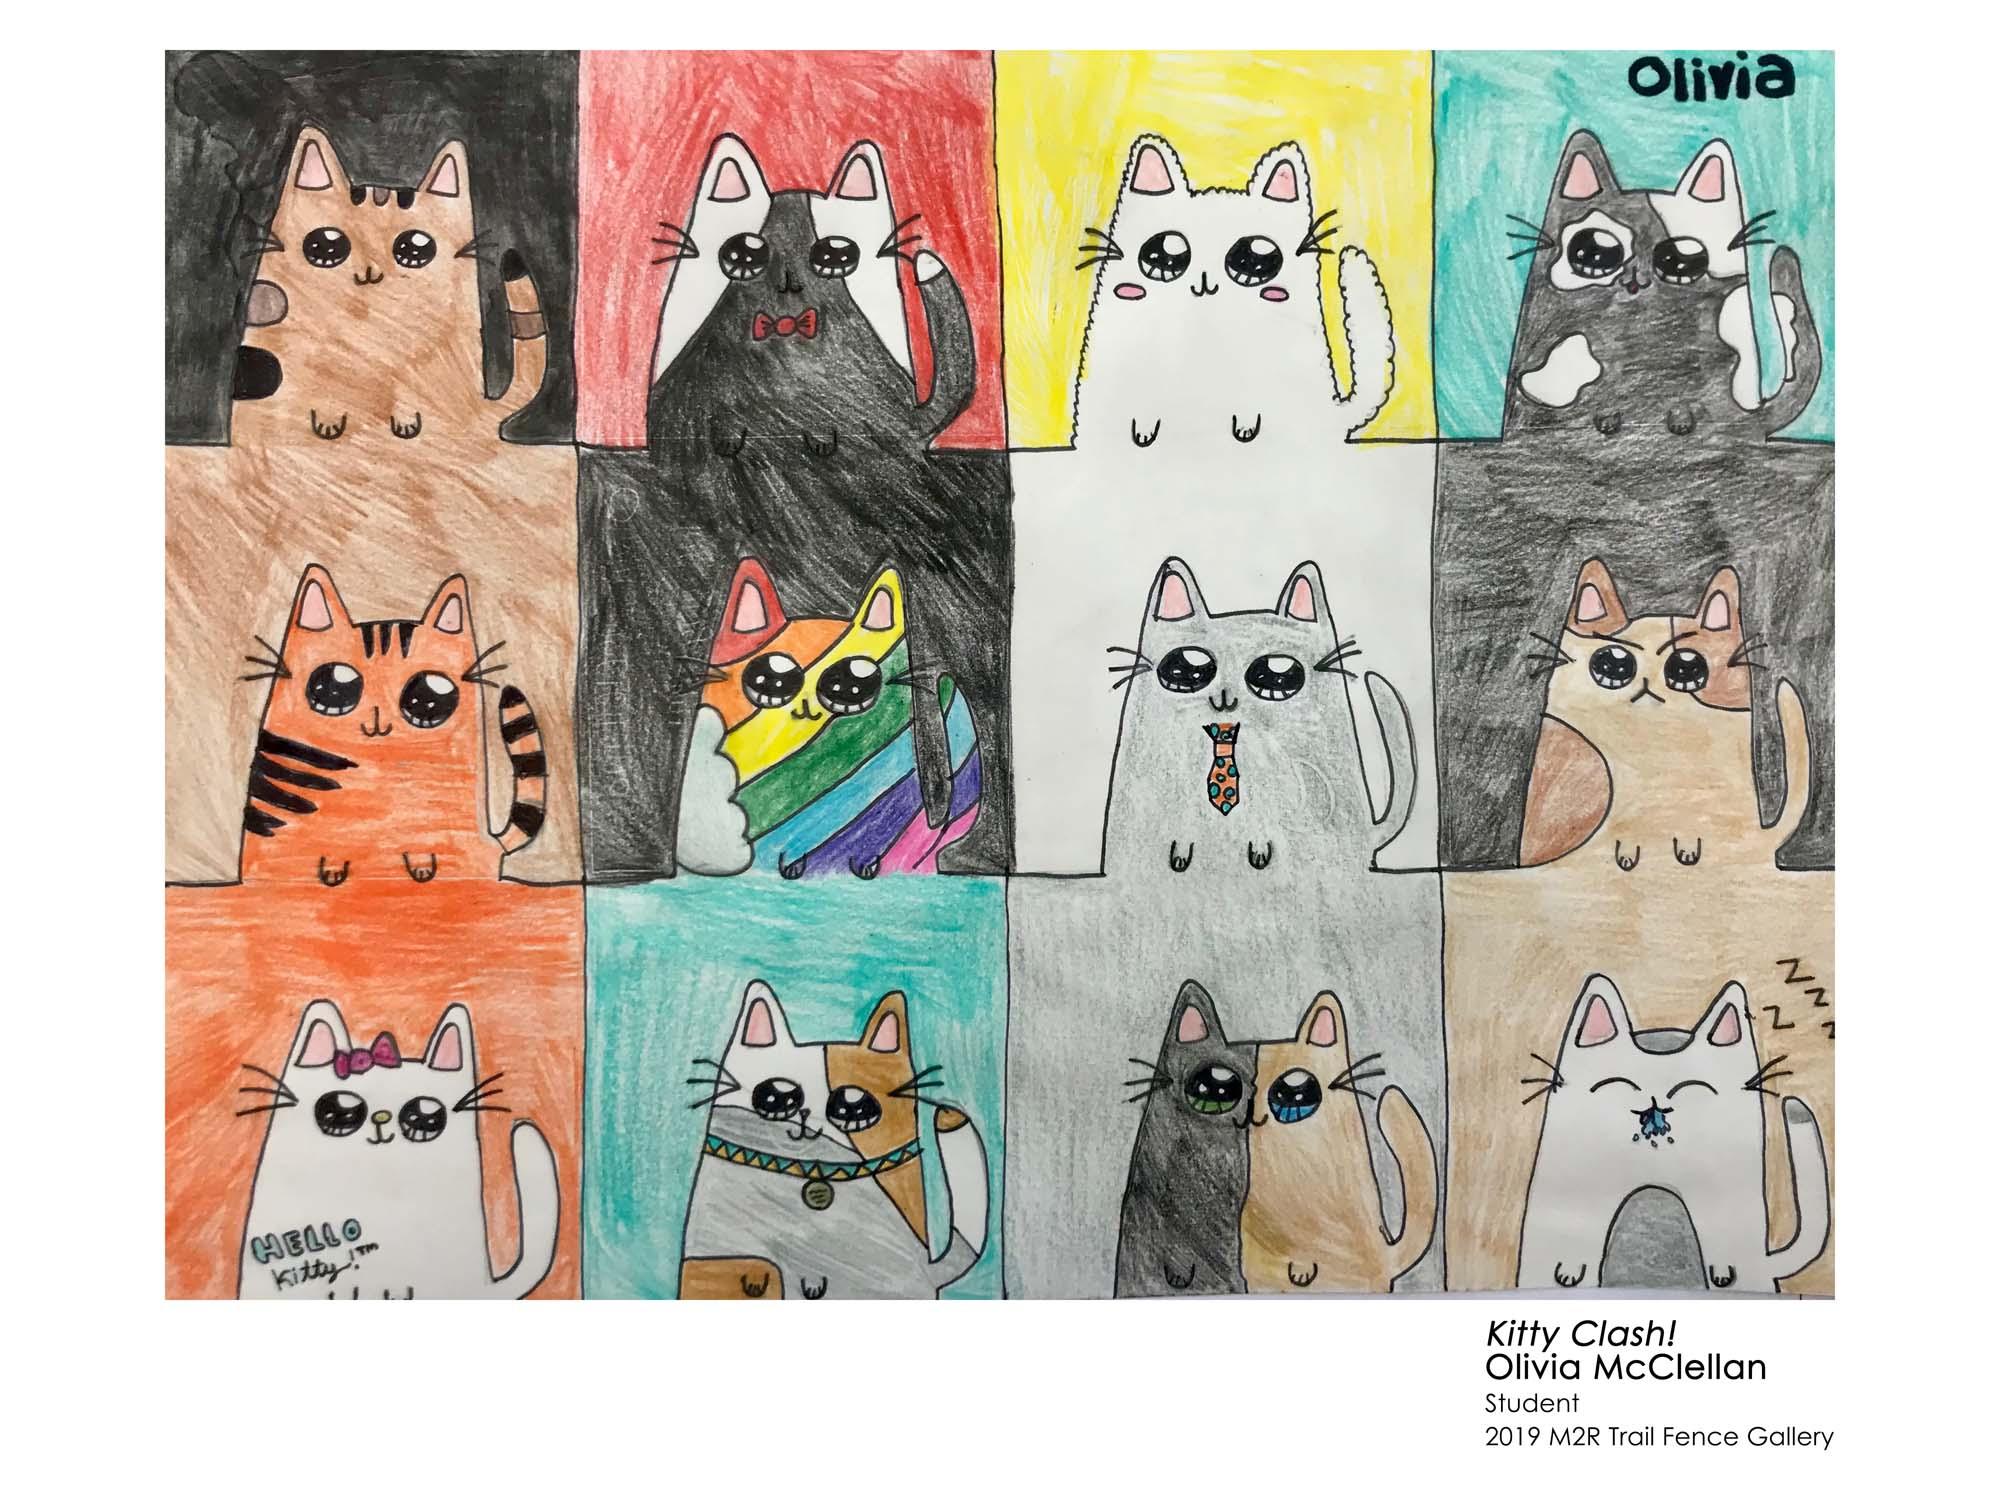 Olivia_McClelland_Kitty Clash! - Claire Dunaway Cyr.jpg